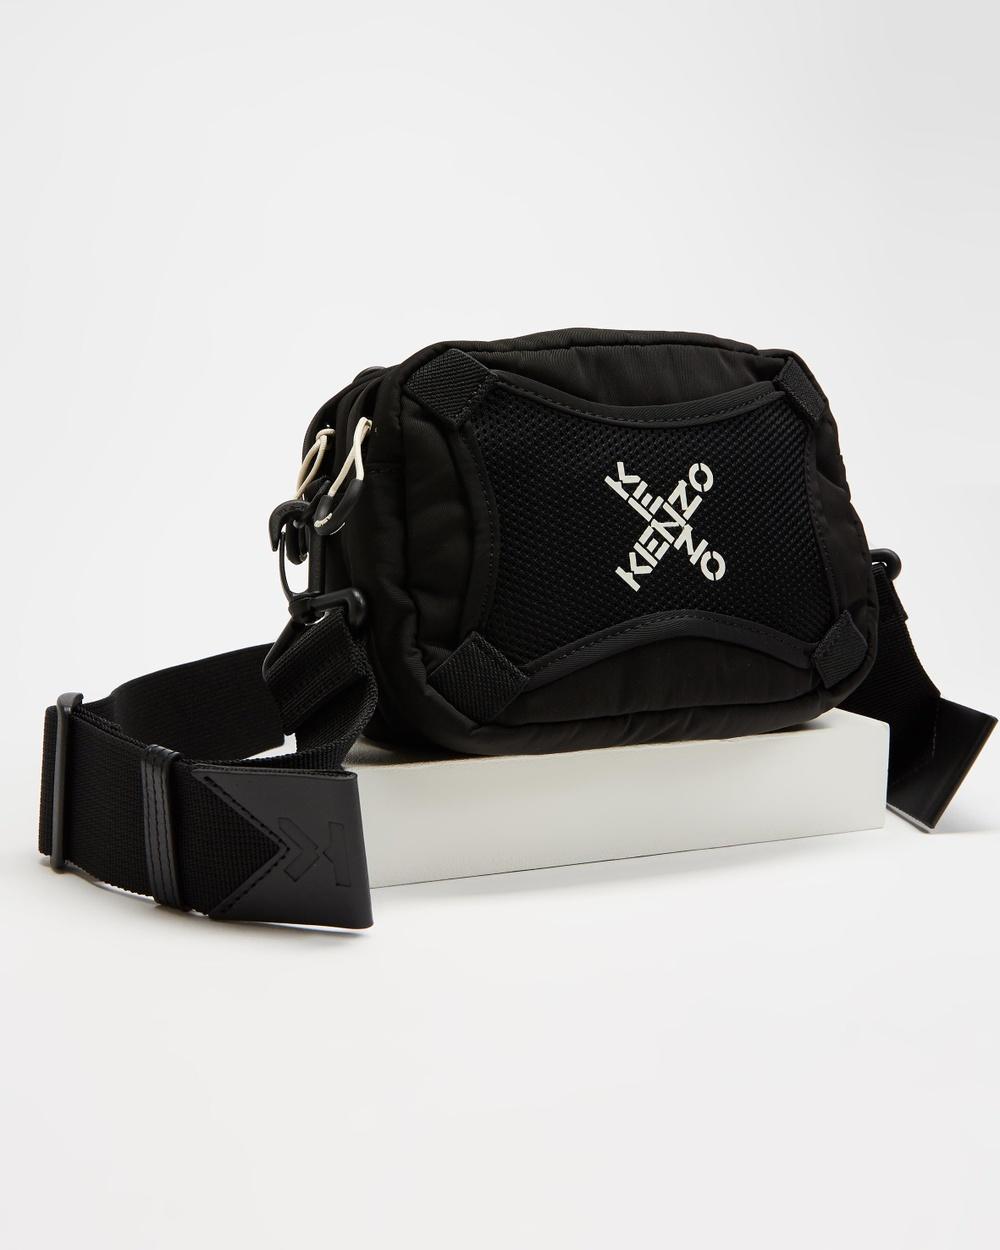 Kenzo Crossbody Bum Bags Black